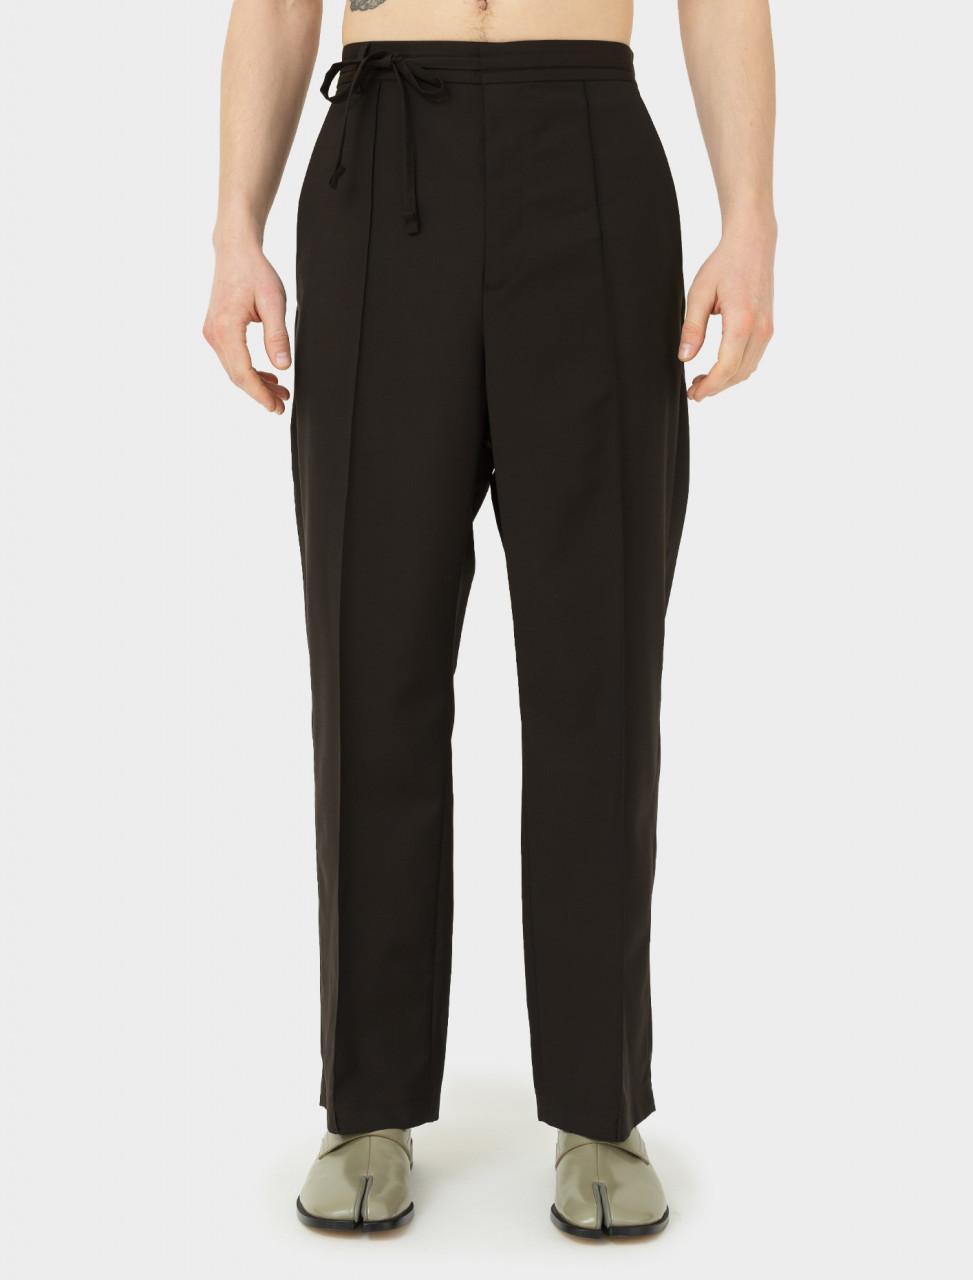 Tie Waist Trouser in Brown